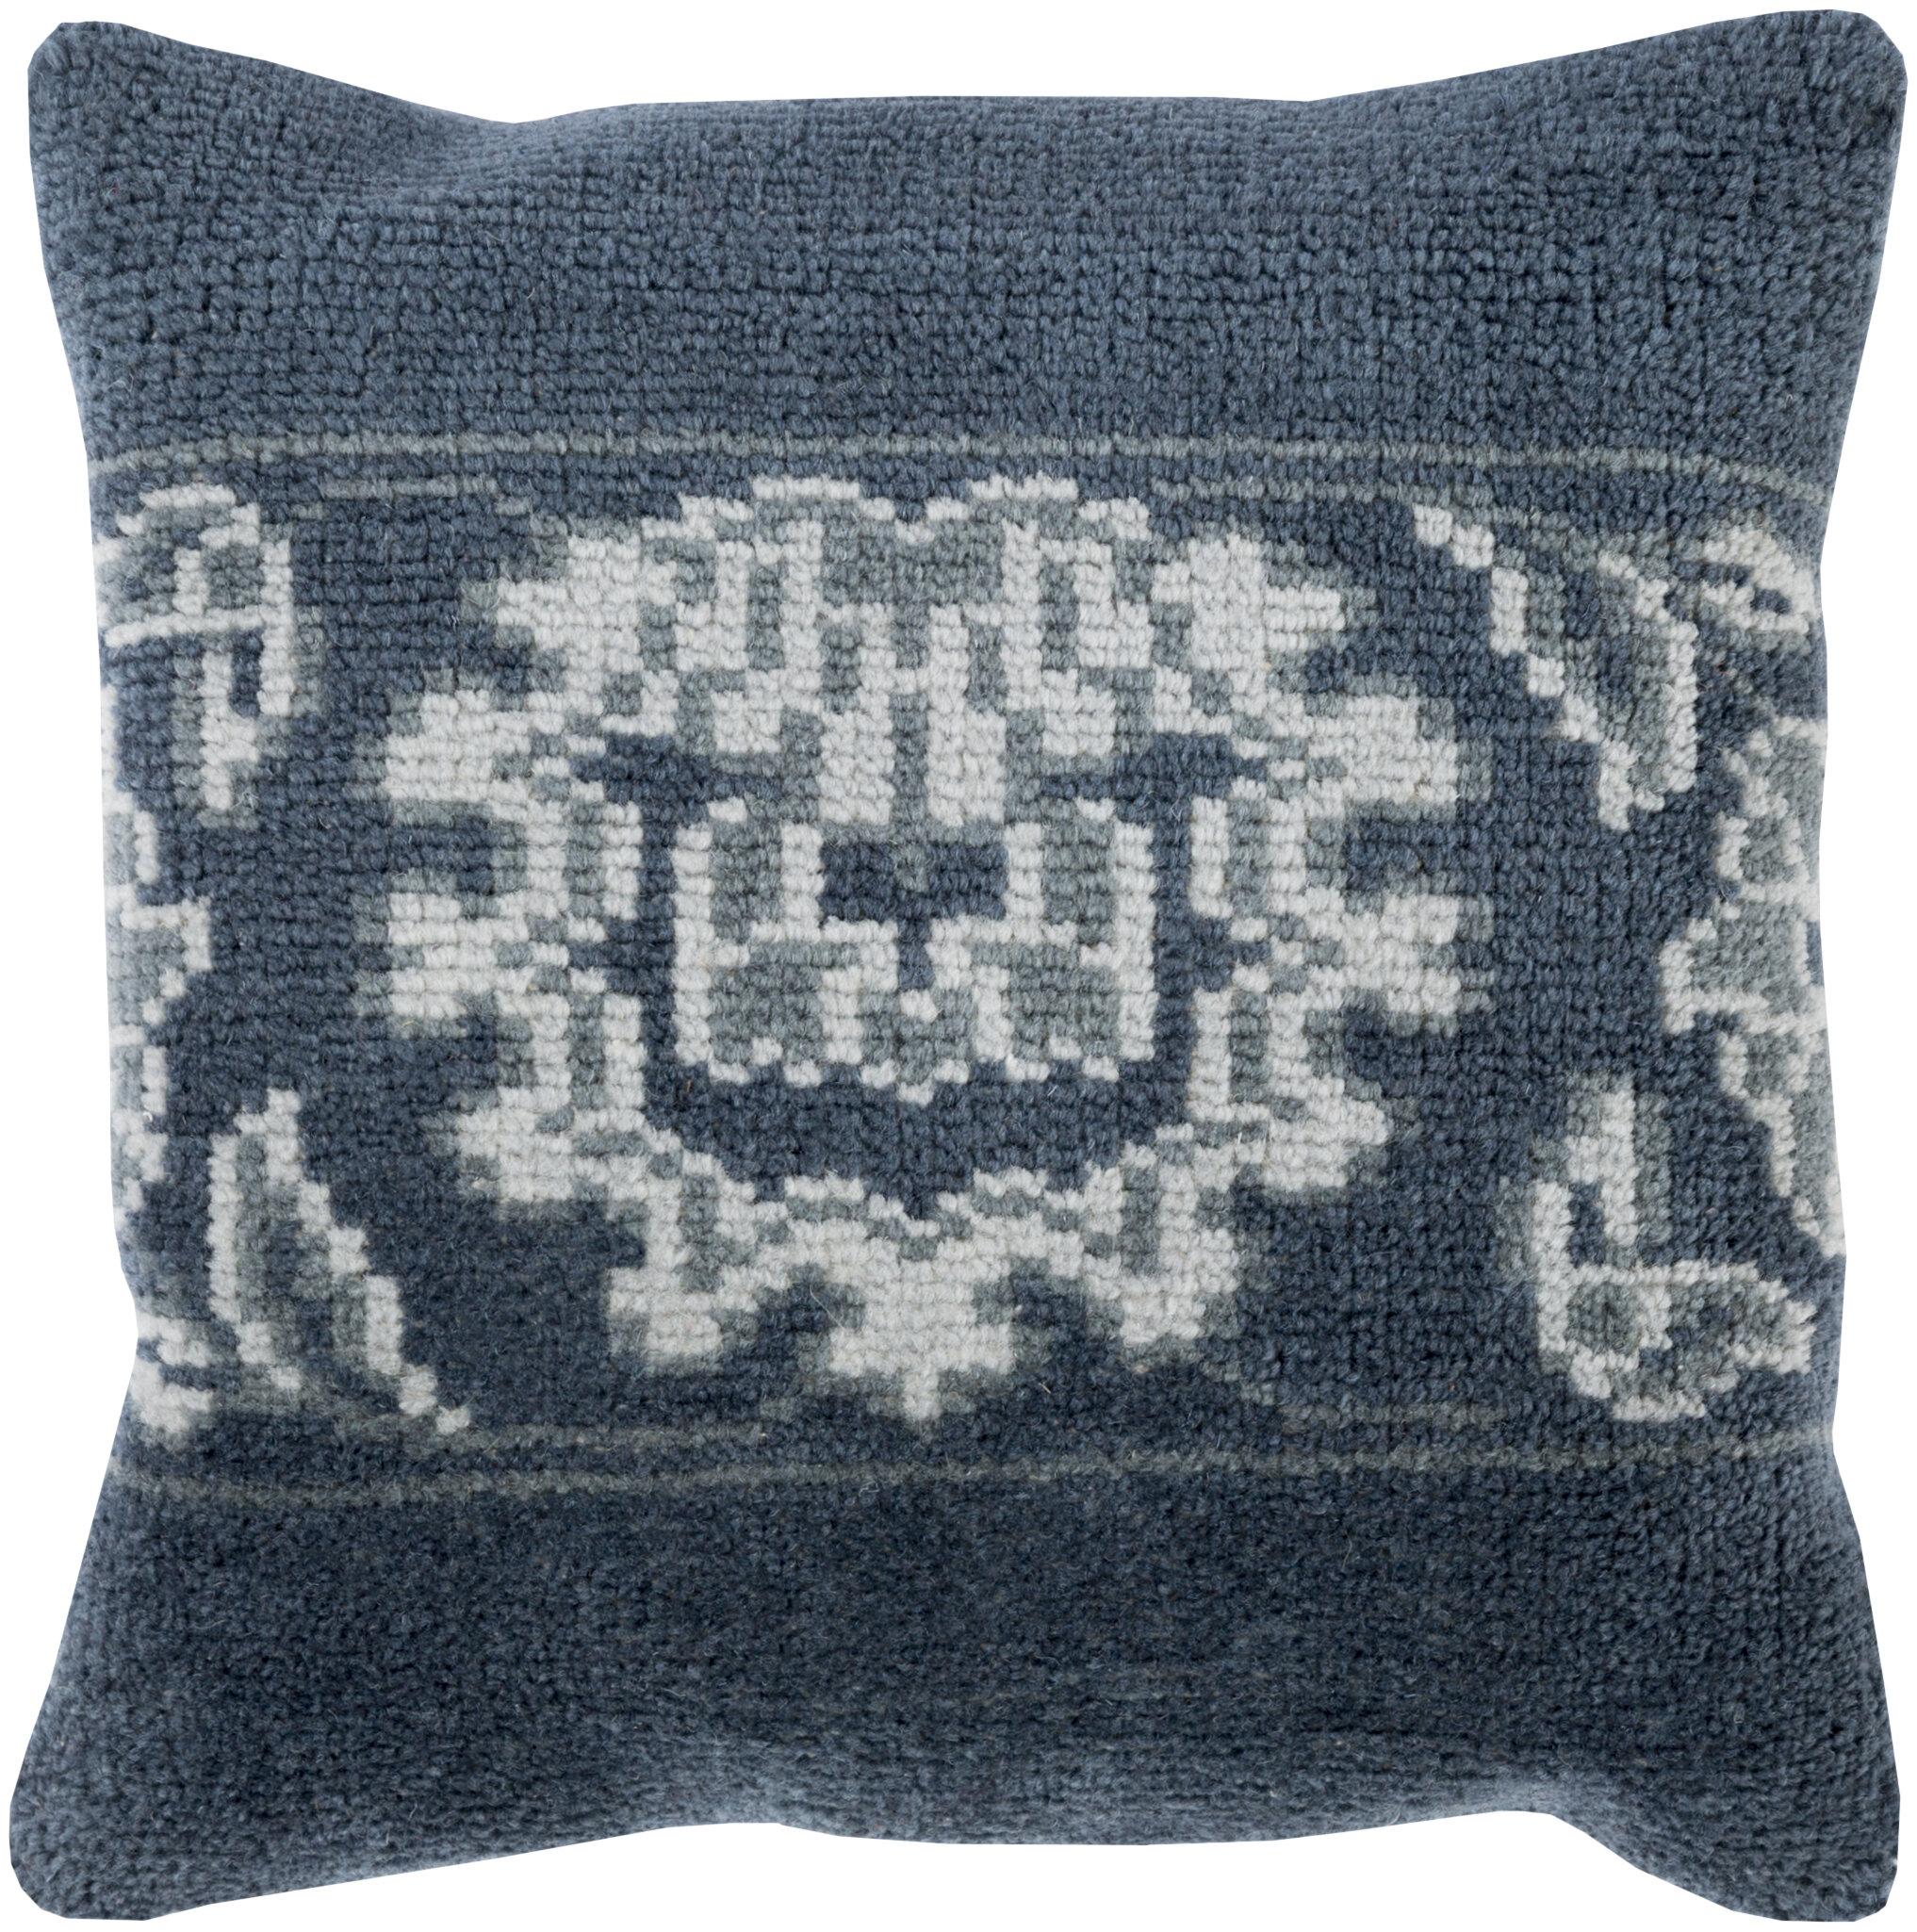 Darby Home Co Sharman Wool Throw Pillow Wayfair